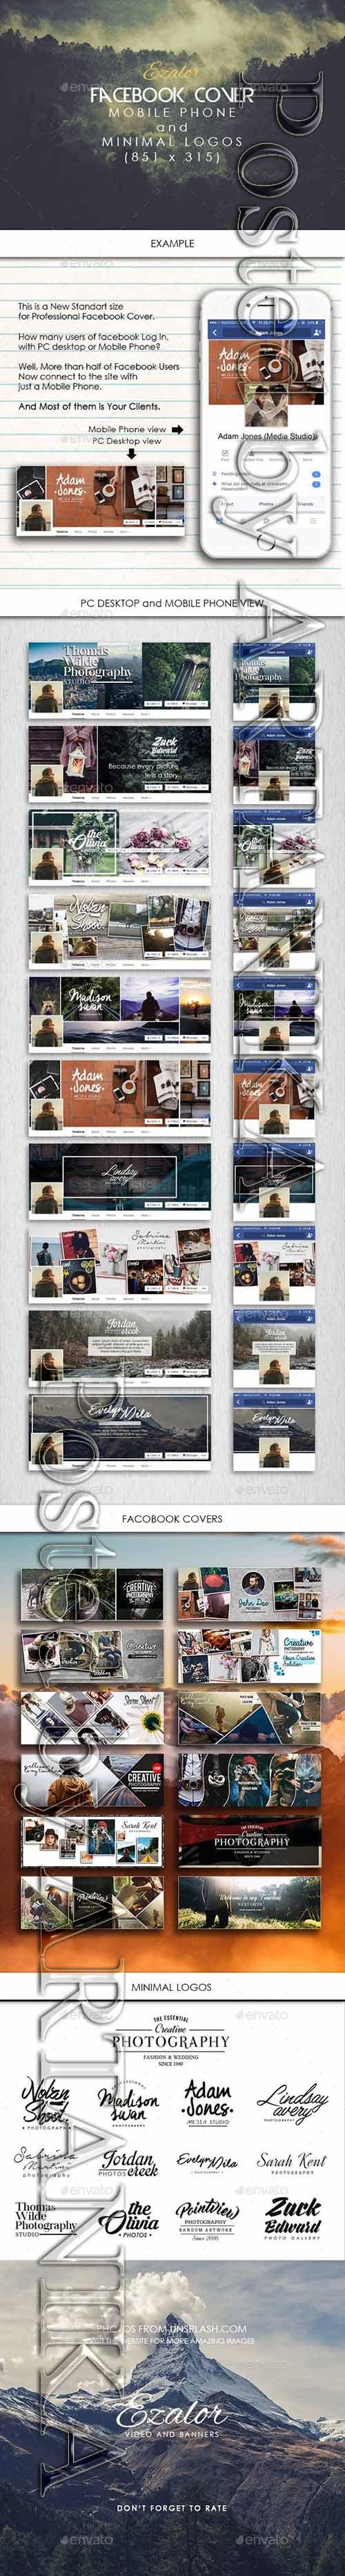 Facebook Cover Photographer Mobile View 18999227